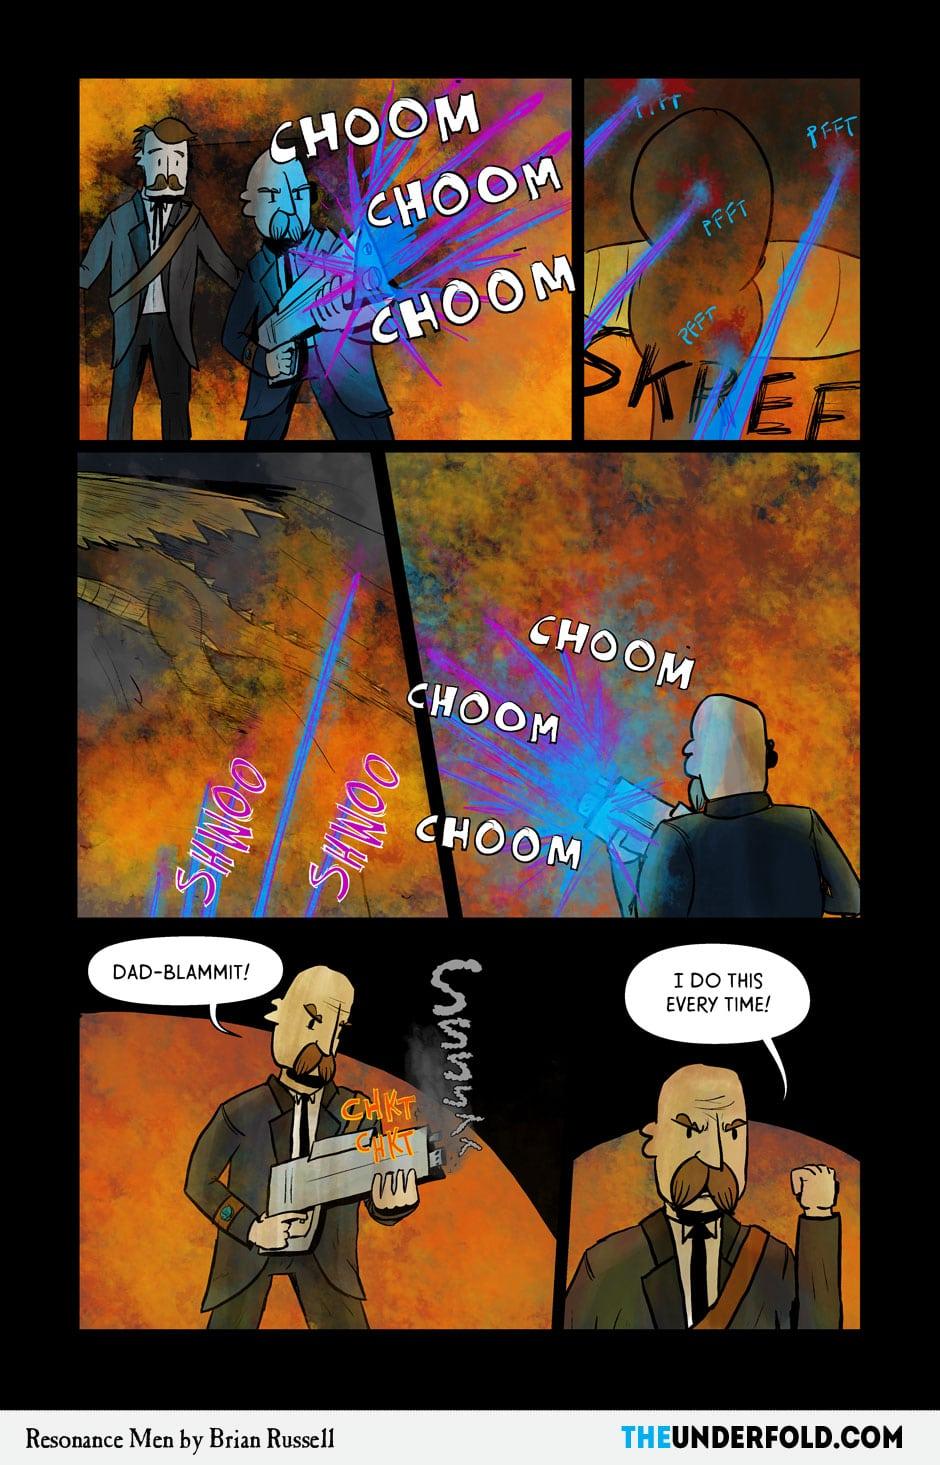 Page 18 – Dad-blammit!